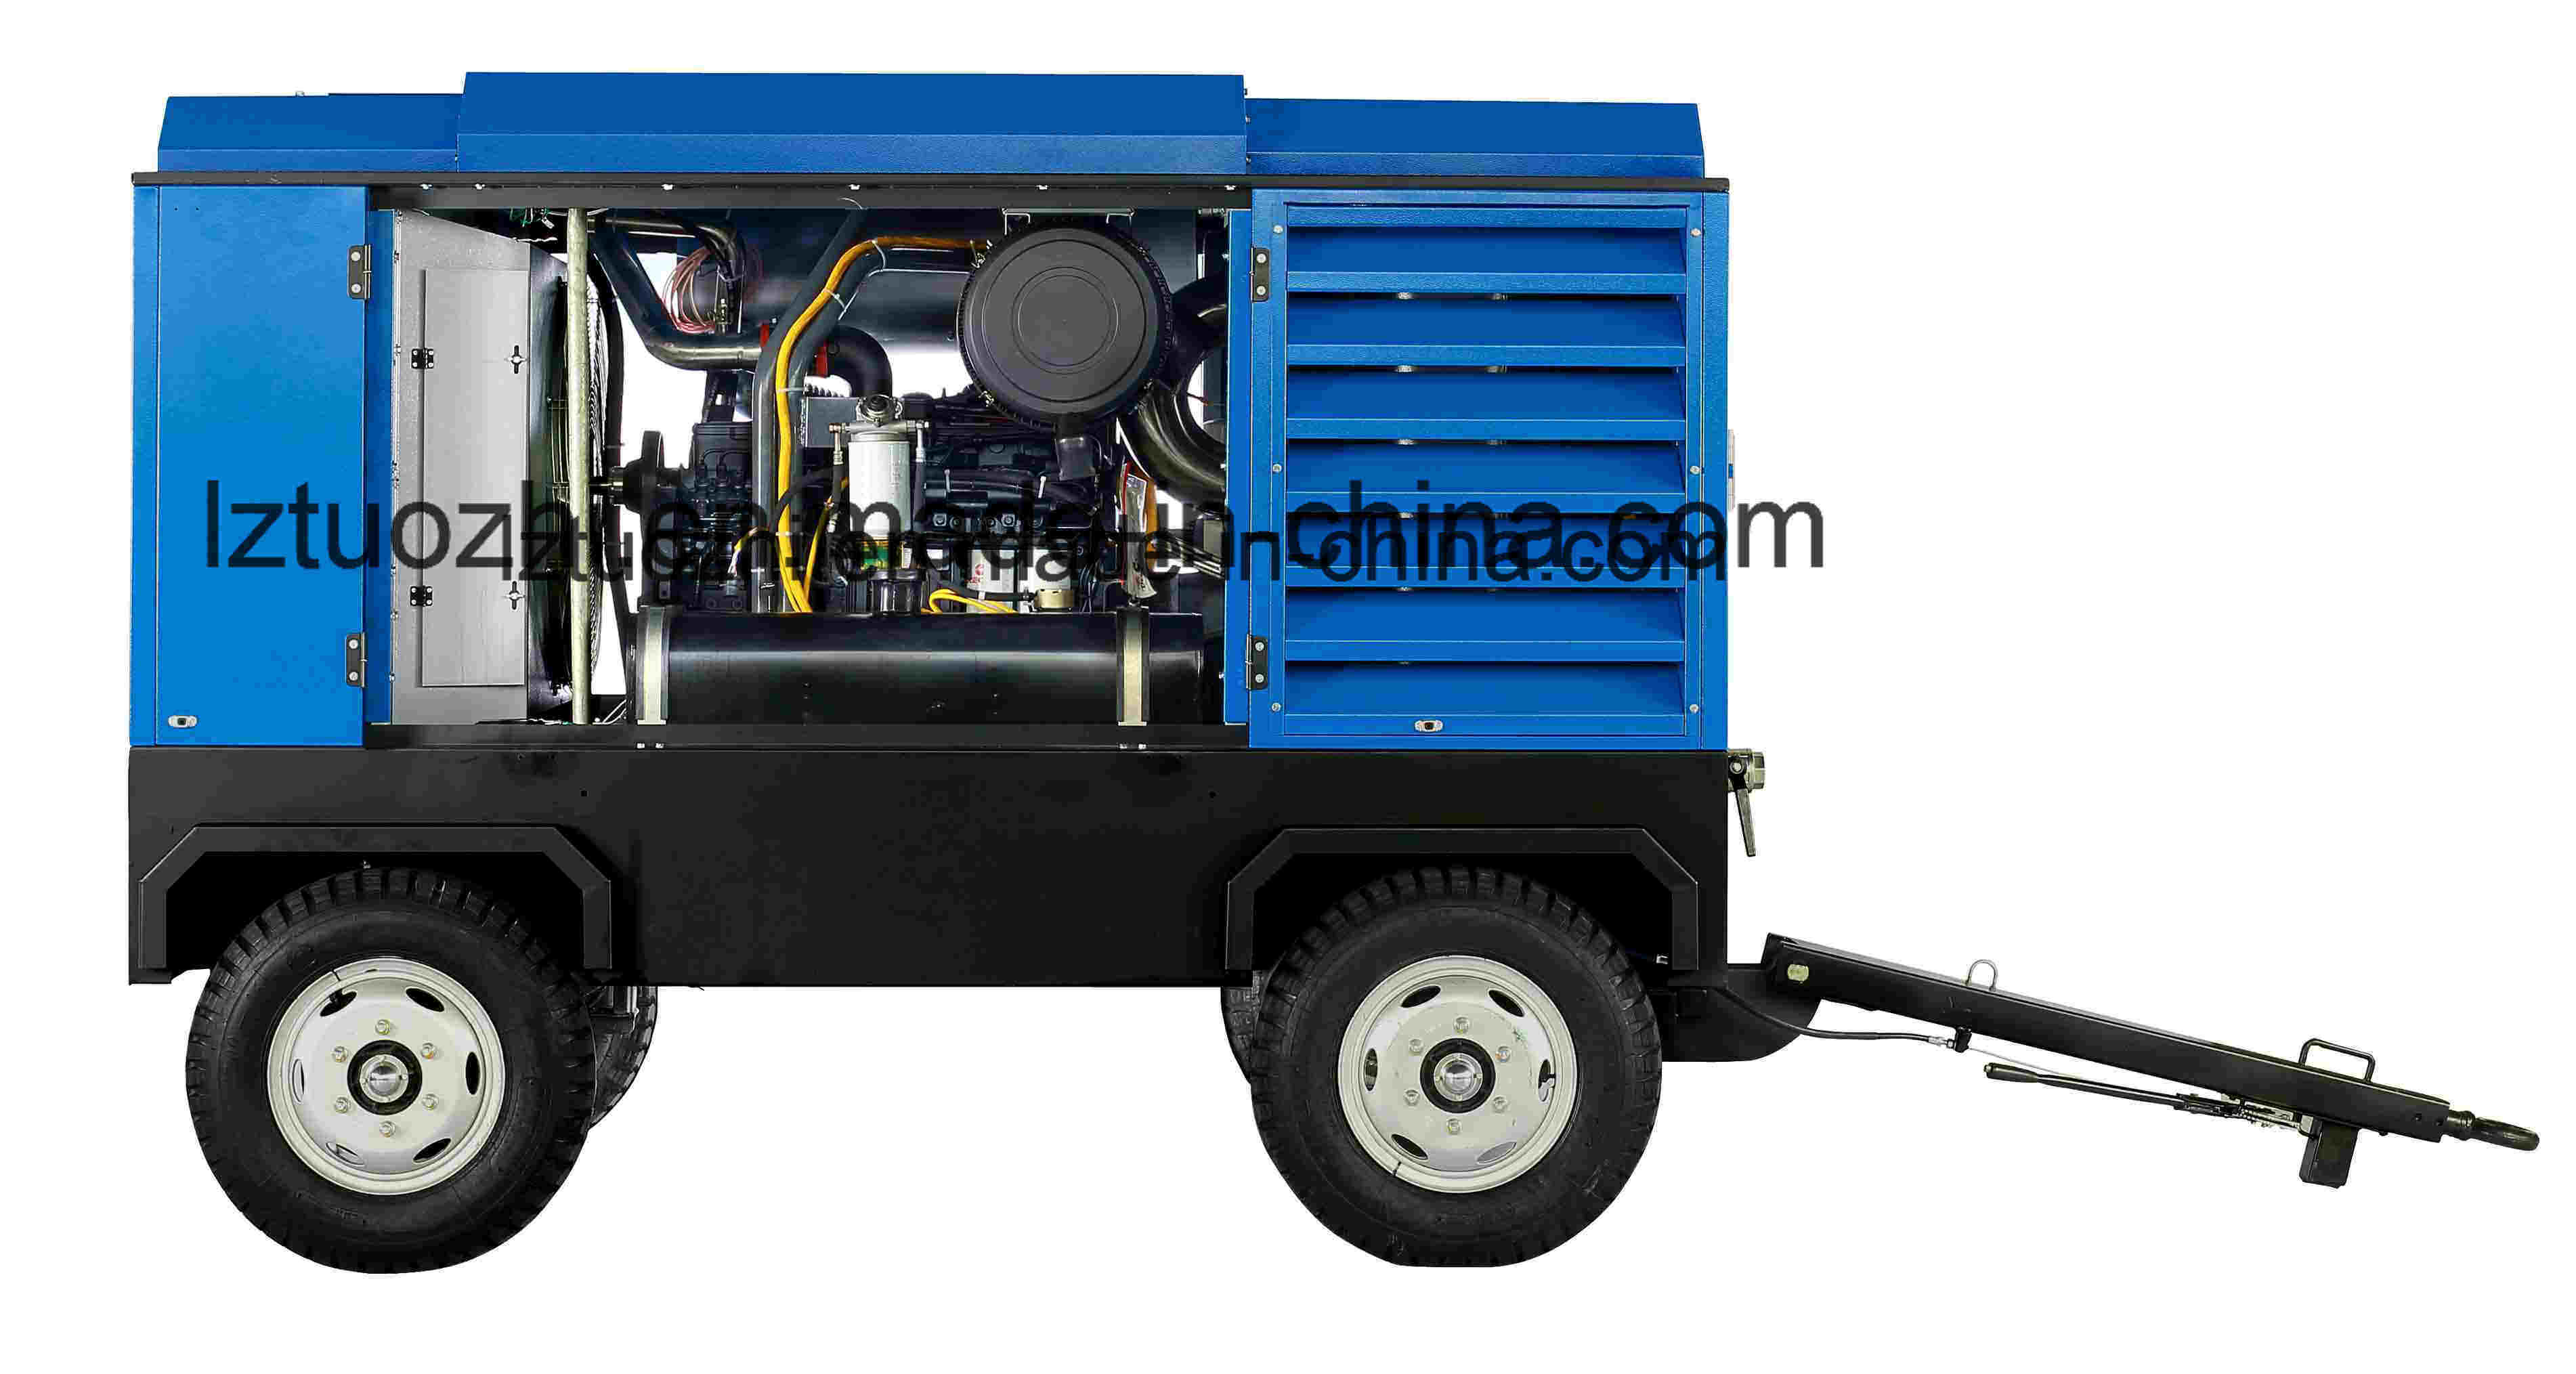 Atlas Copco Liutech 1250cfm 25bar High Pressure Diesel Air Compressor